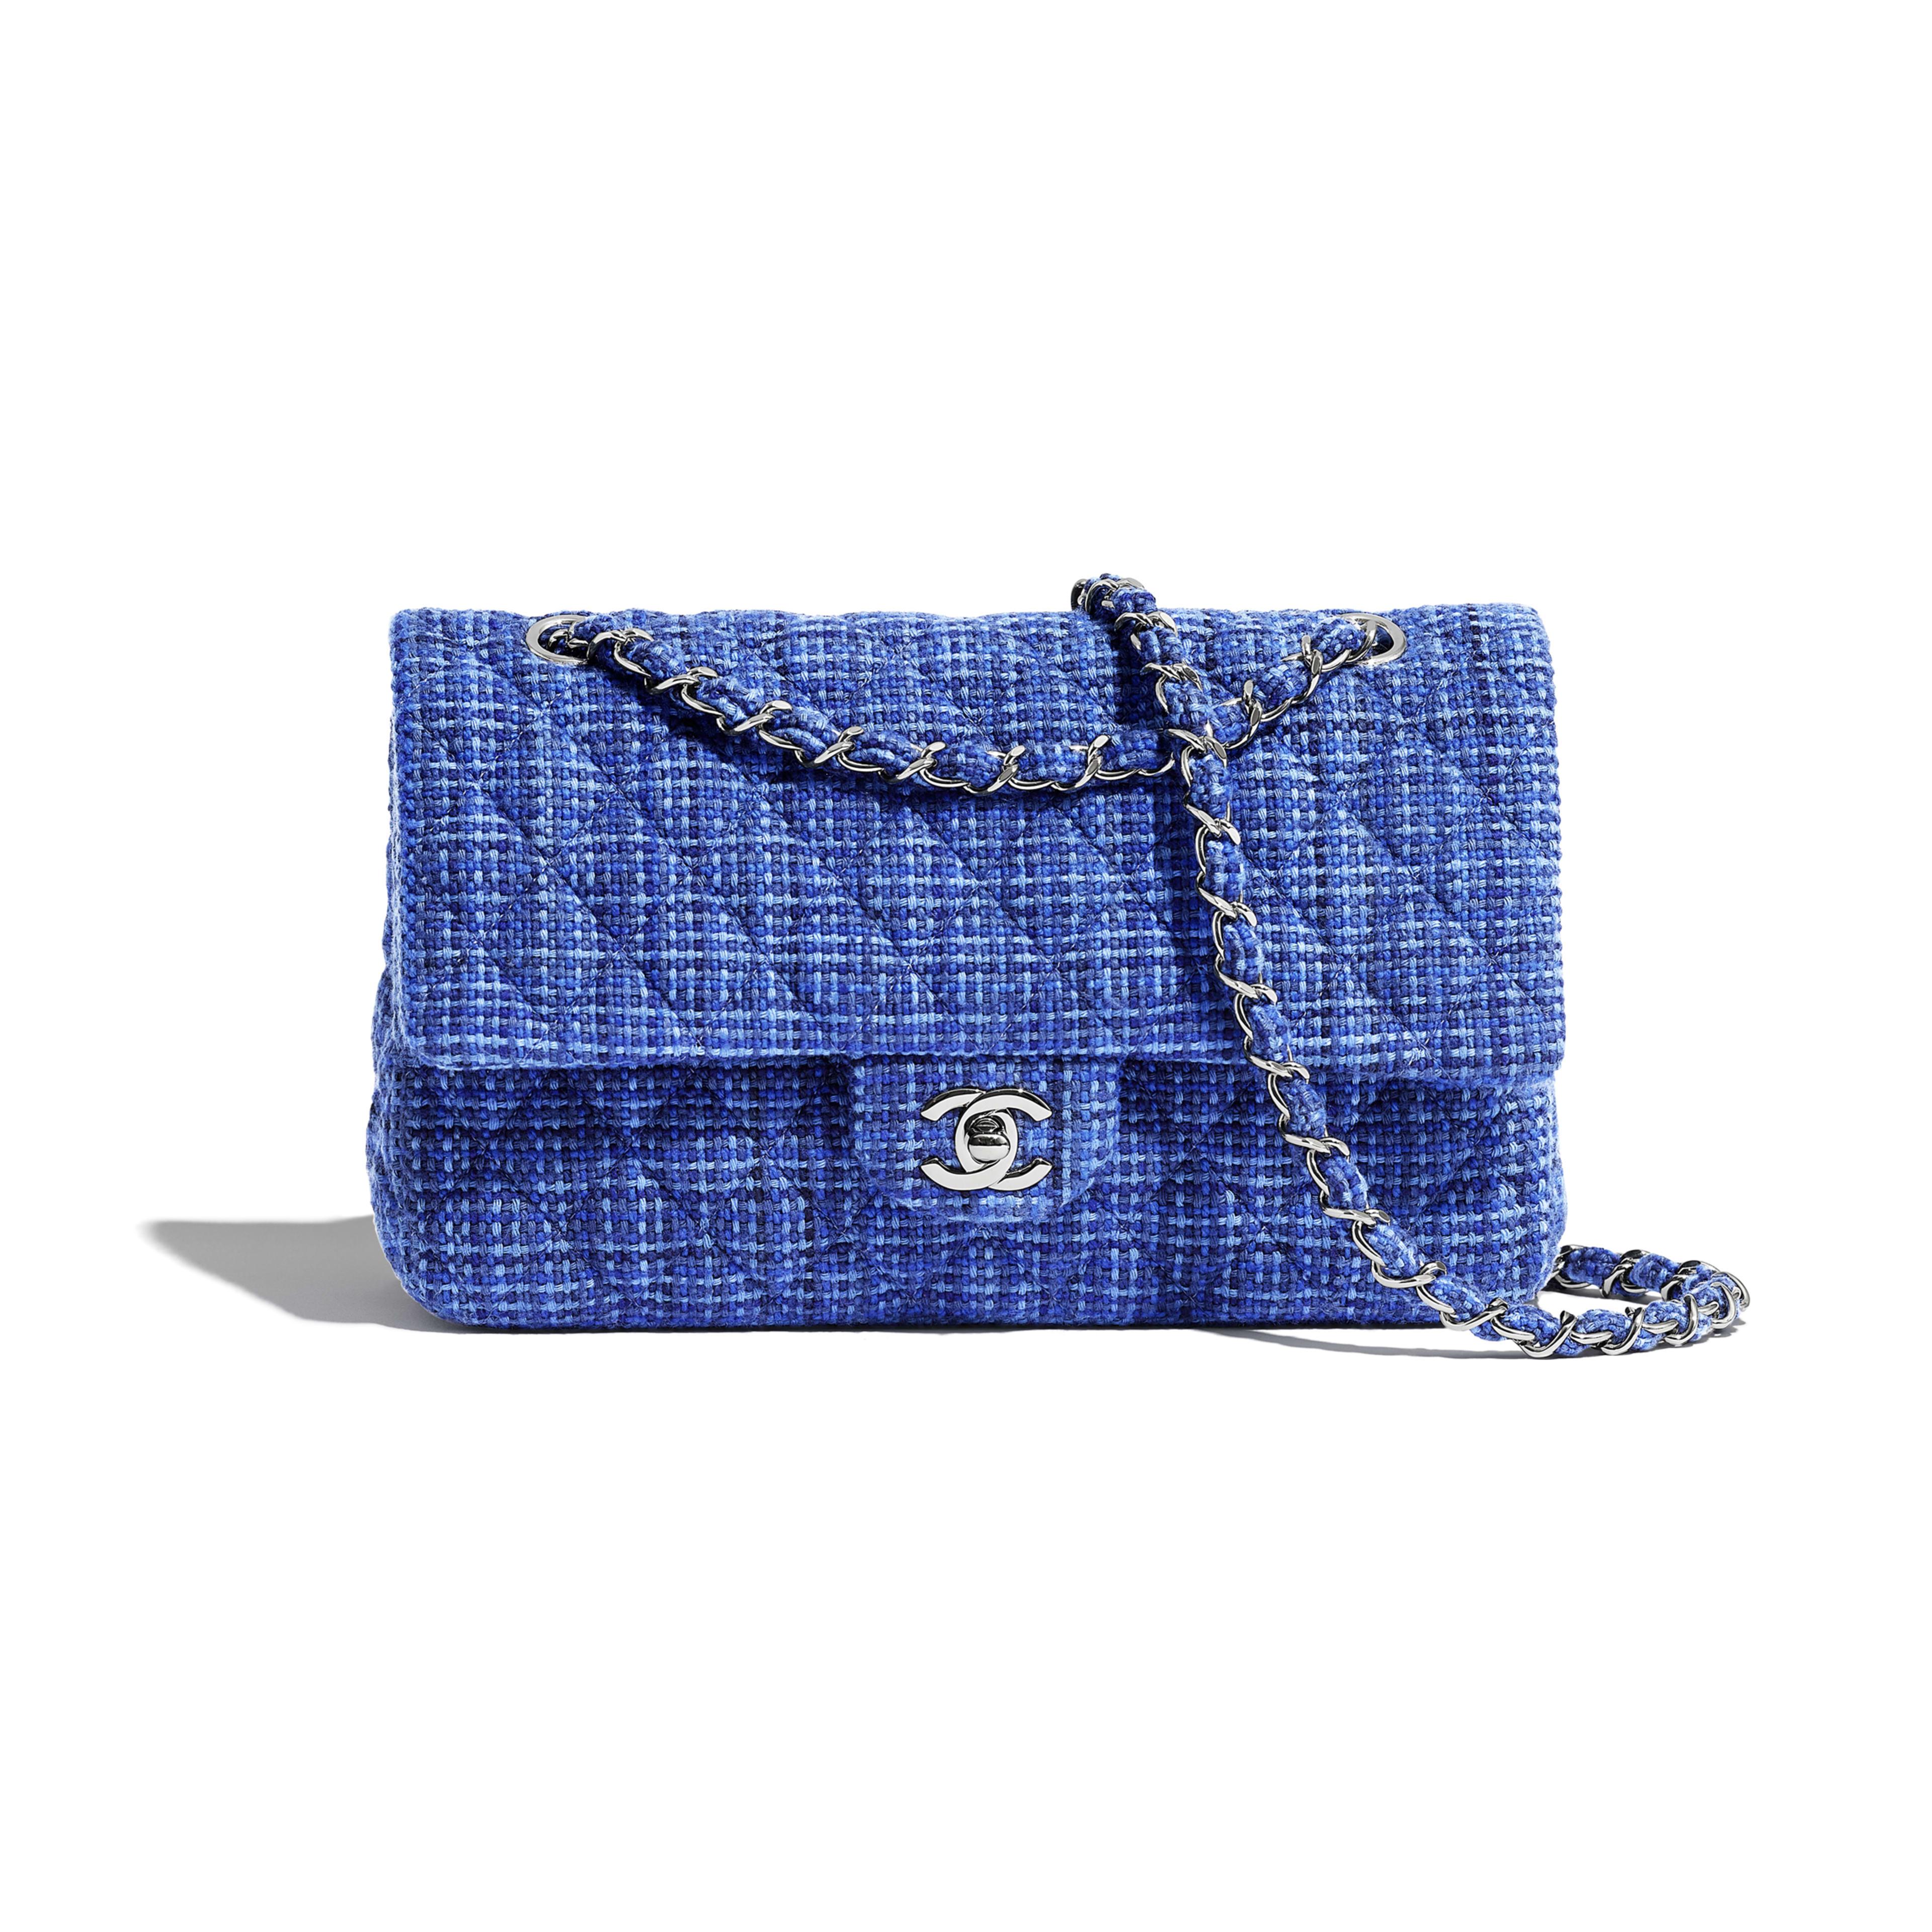 Classic Handbag - Blue - Tweed & Silver-Tone Metal - Default view - see full sized version